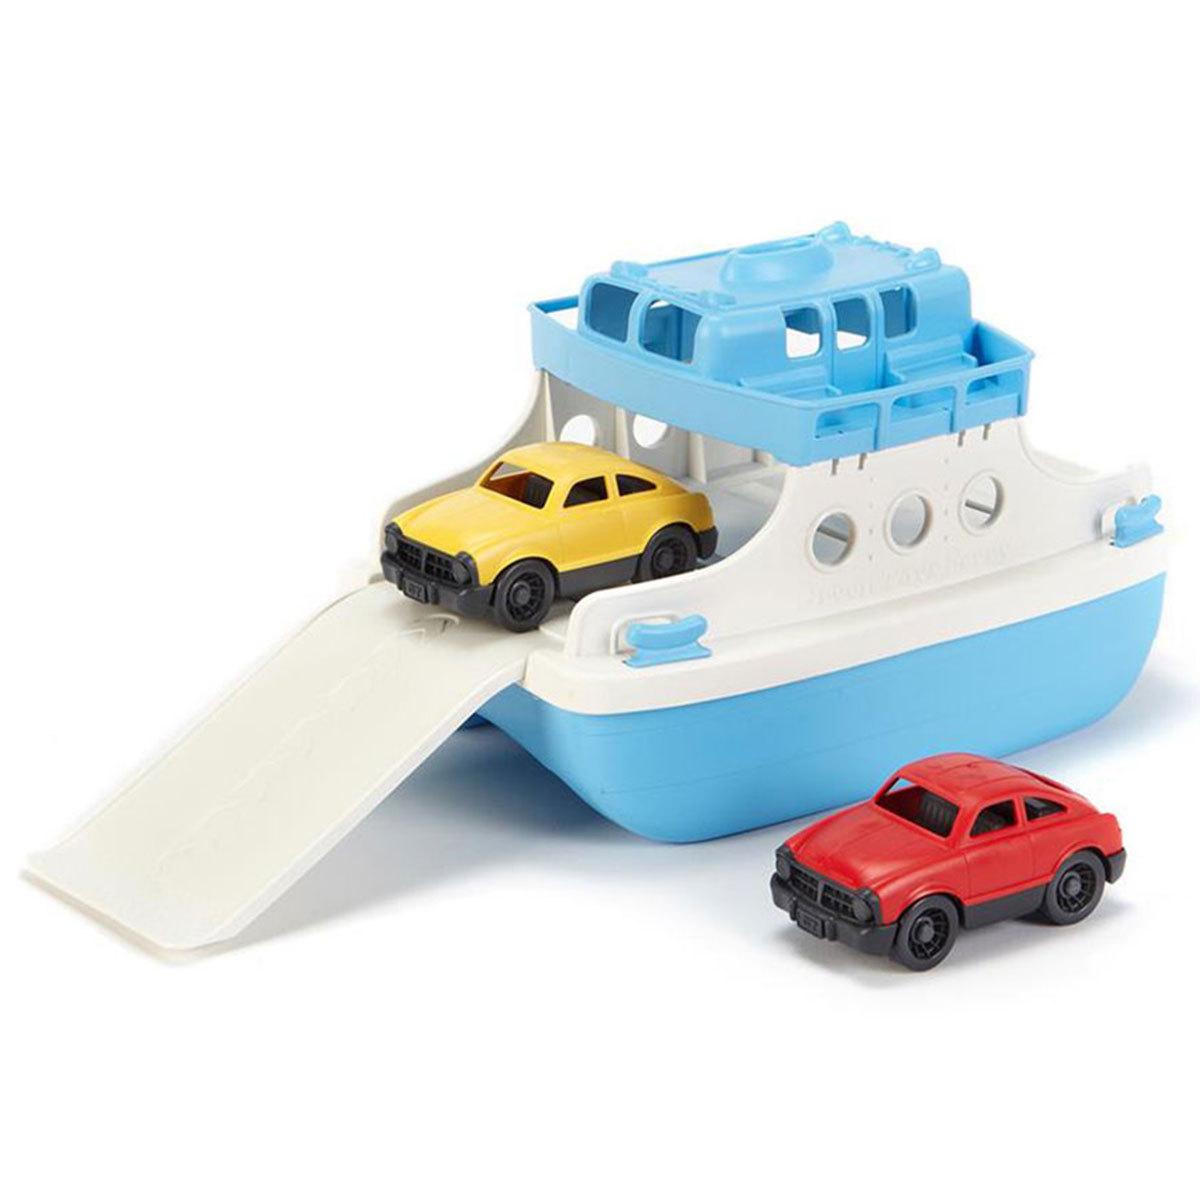 Mes premiers jouets Jeu de Bain Ferry Jeu de Bain Ferry